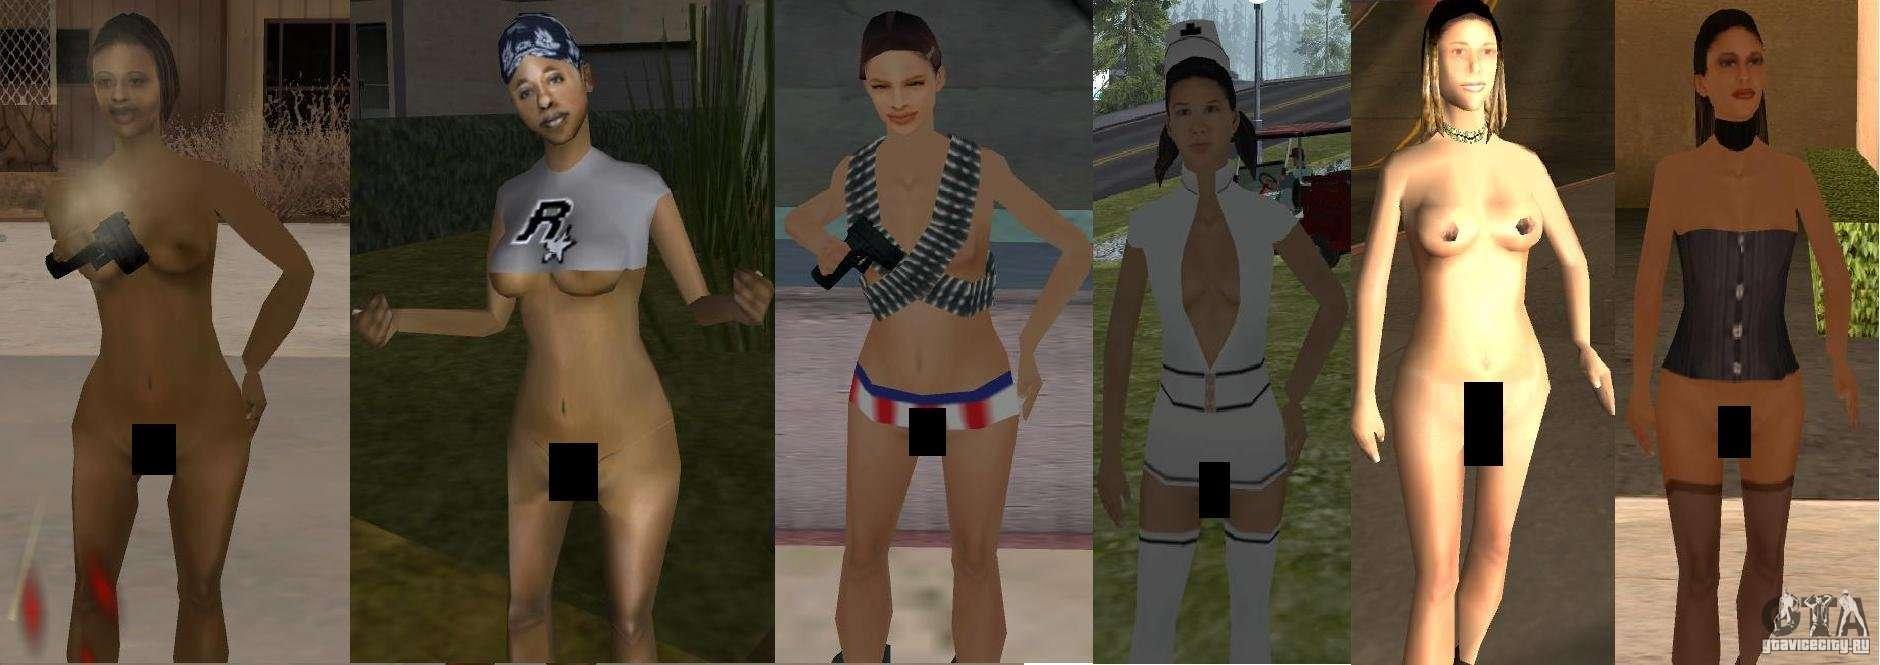 penis-grand-theft-auto-women-nudity-latina-milf-xxx